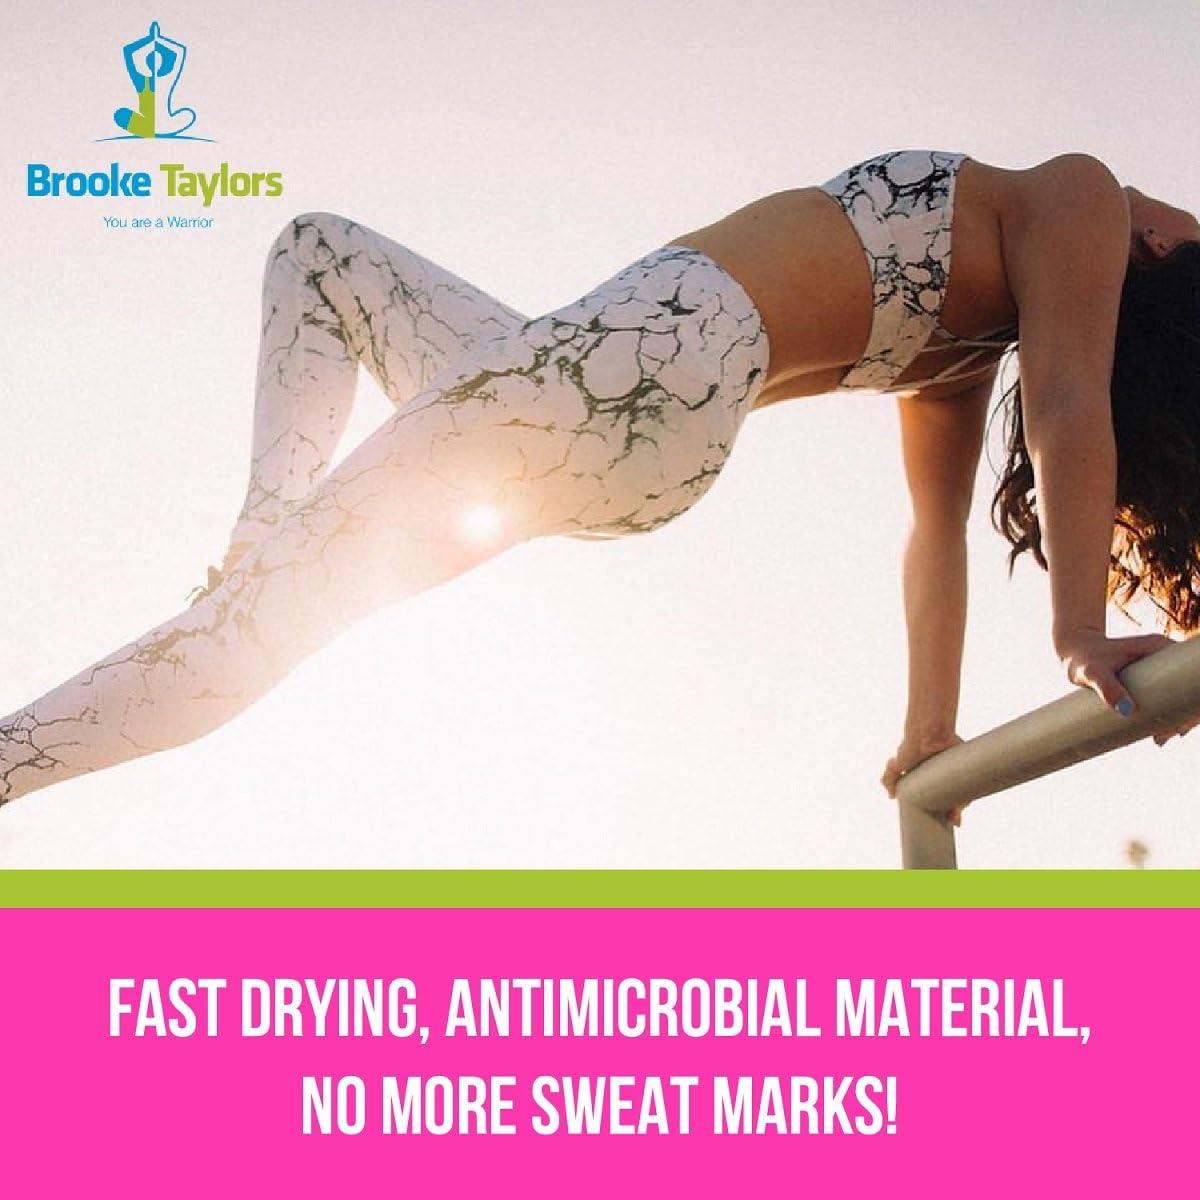 Brooke Taylors Yoga Kristen Sports Compression Bra Yoga Top for Women